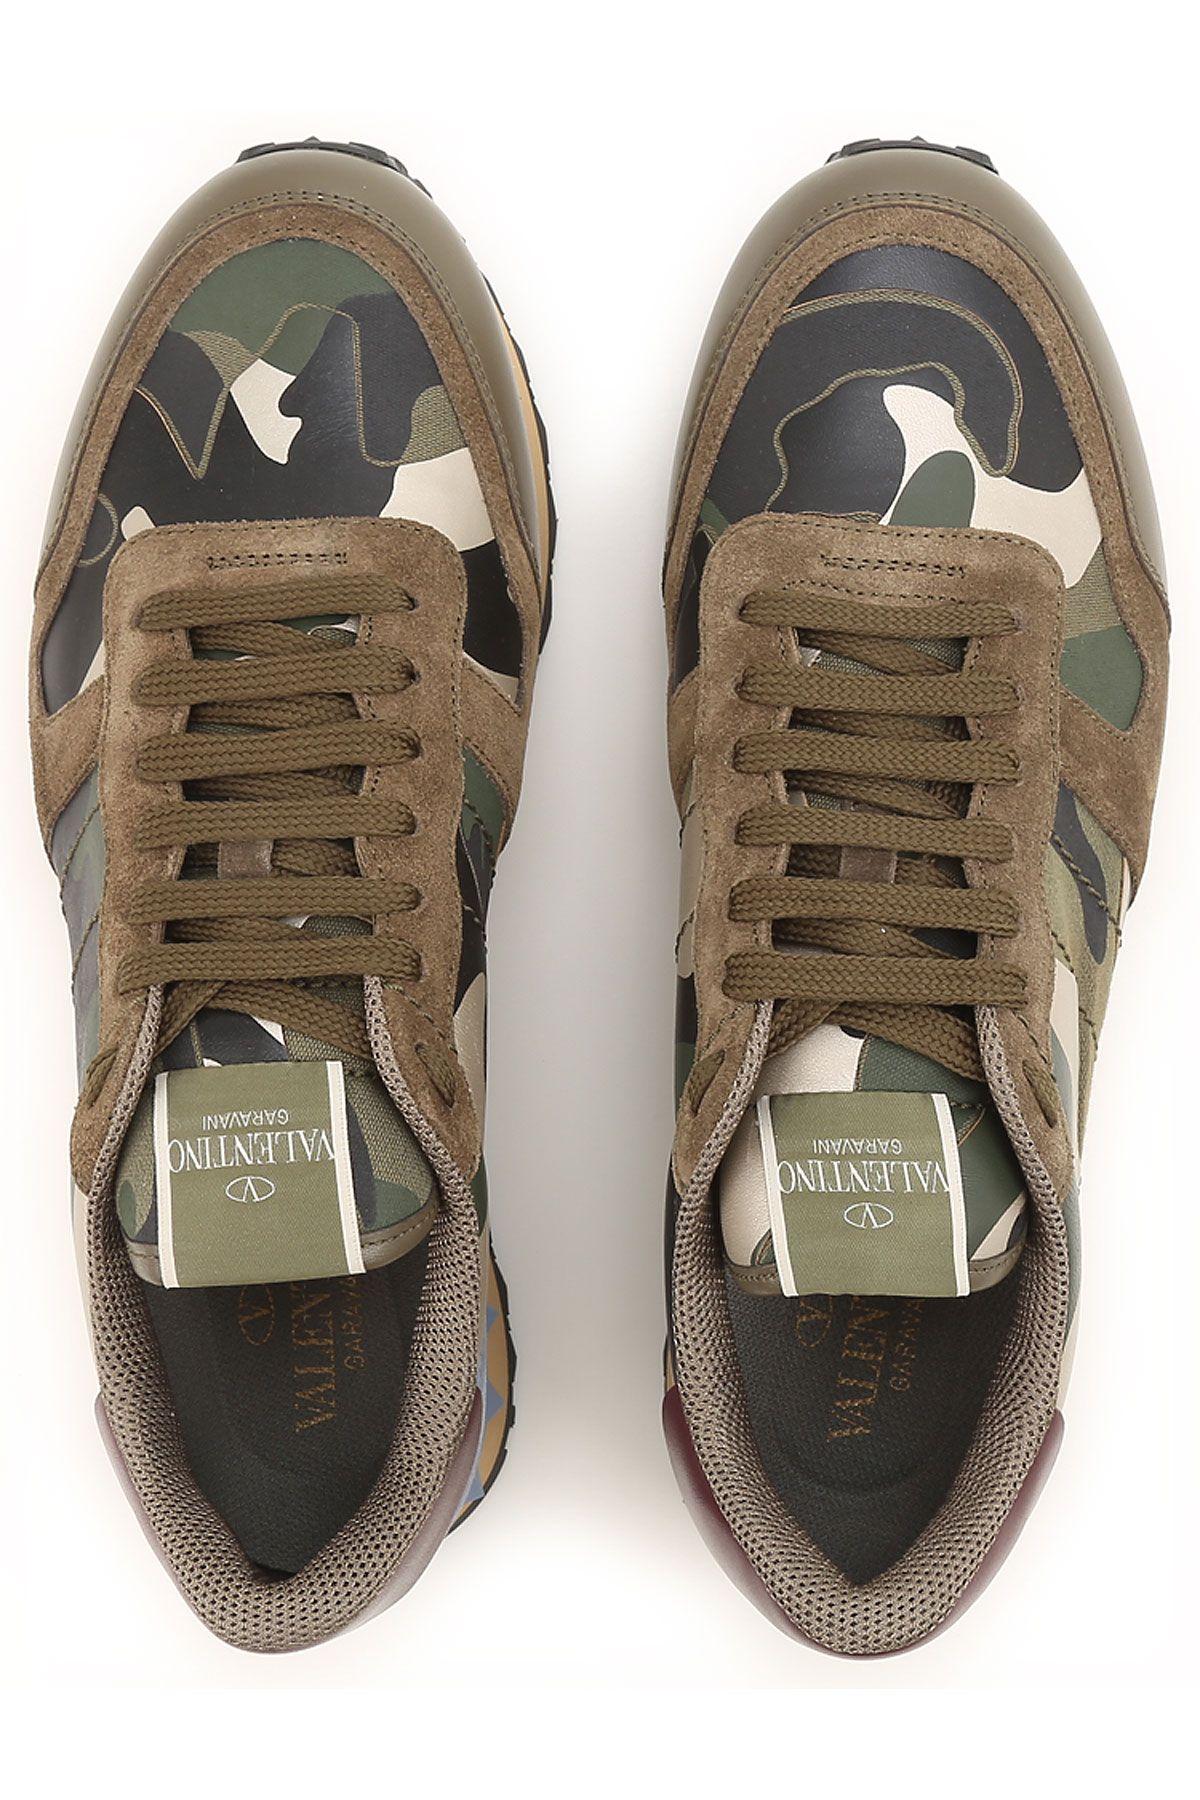 4b5e9f013bb16 Chaussures Valentino pour Homme   vetements de luxe   Chaussure ...